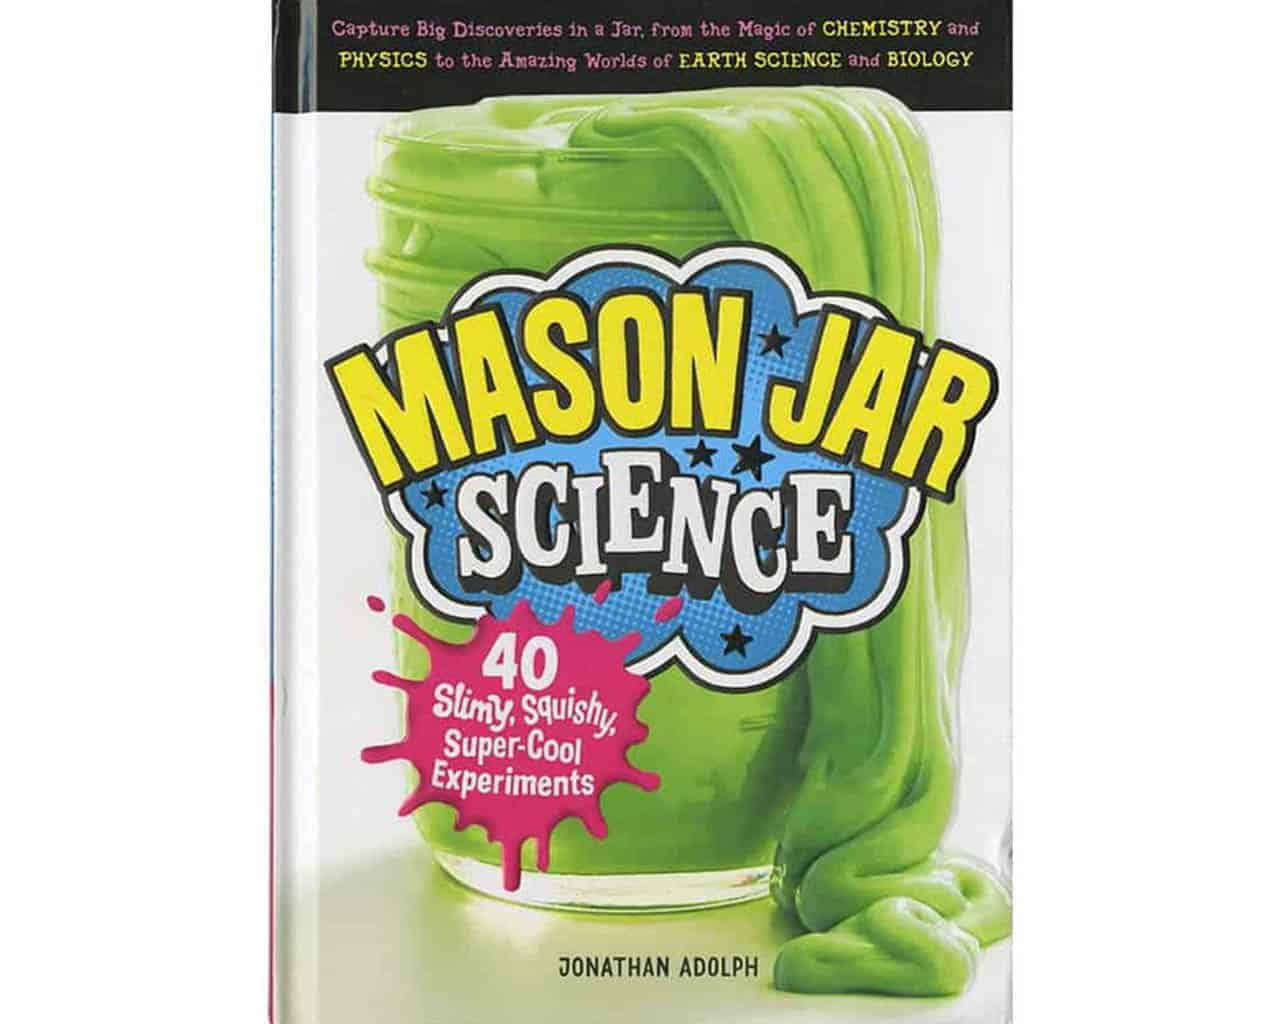 mason-jar-science-40-experiments-jonathan-adolph-book